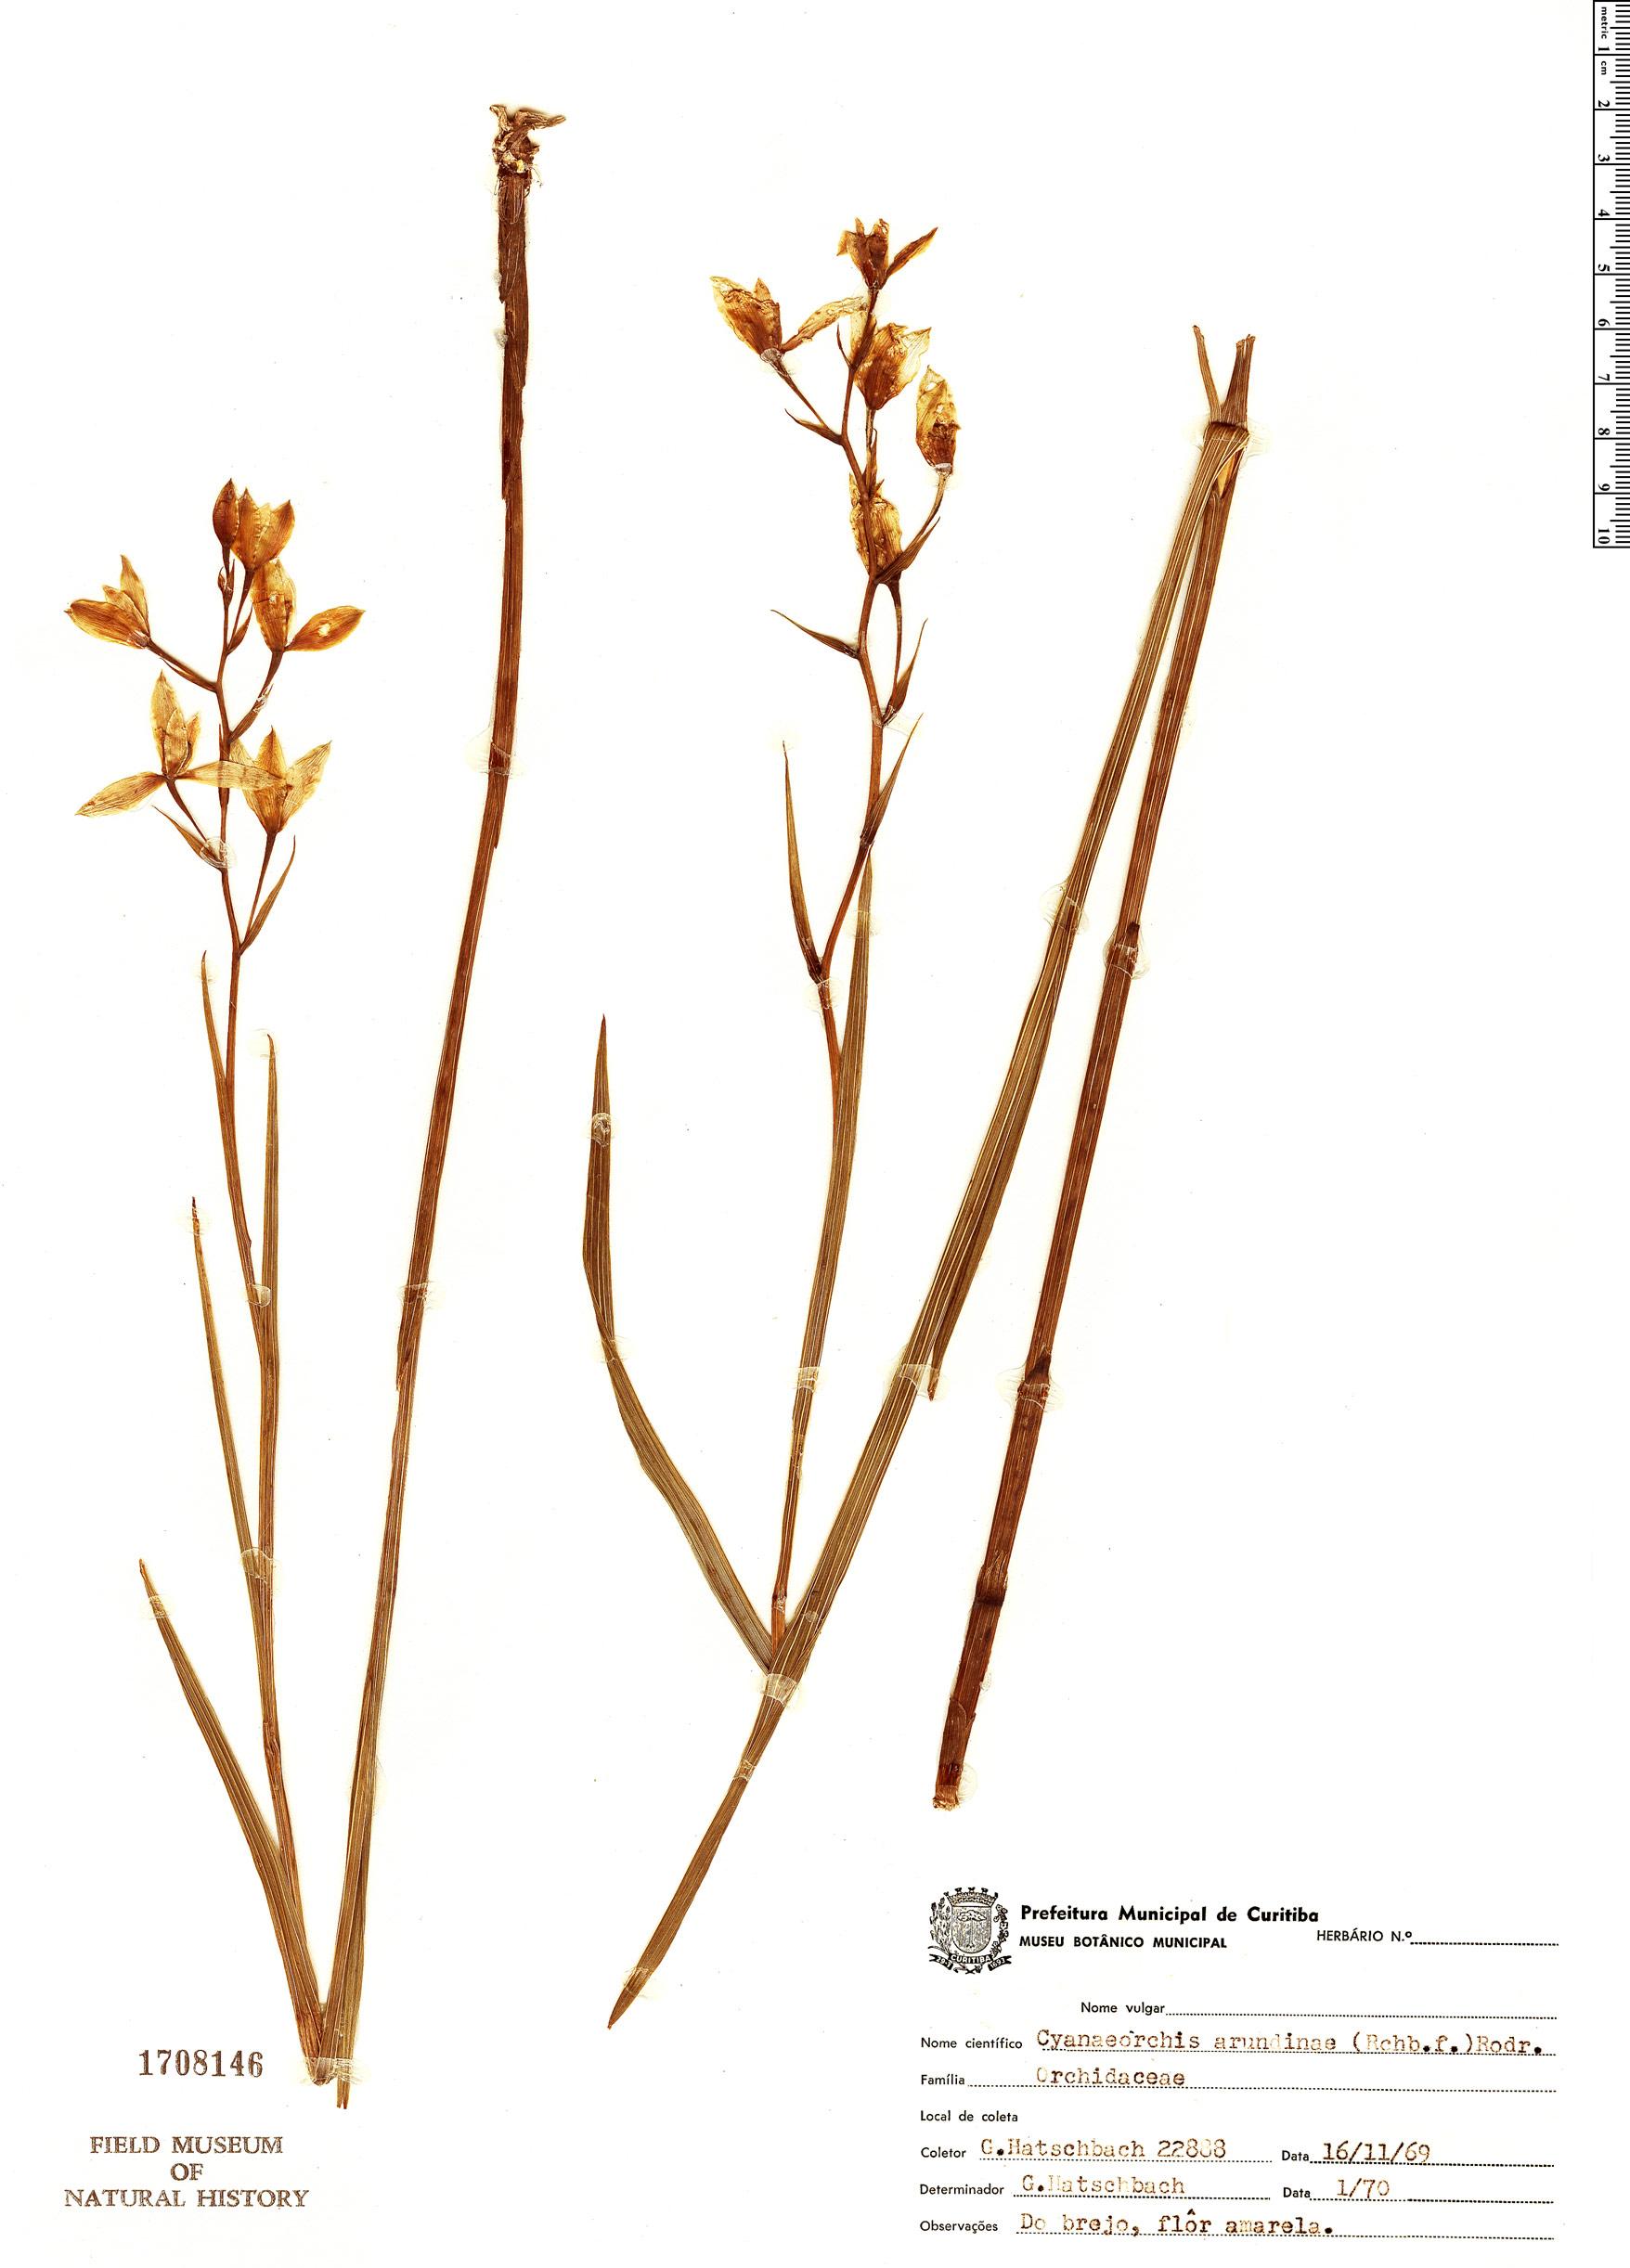 Specimen: Cyanaeorchis arundinae